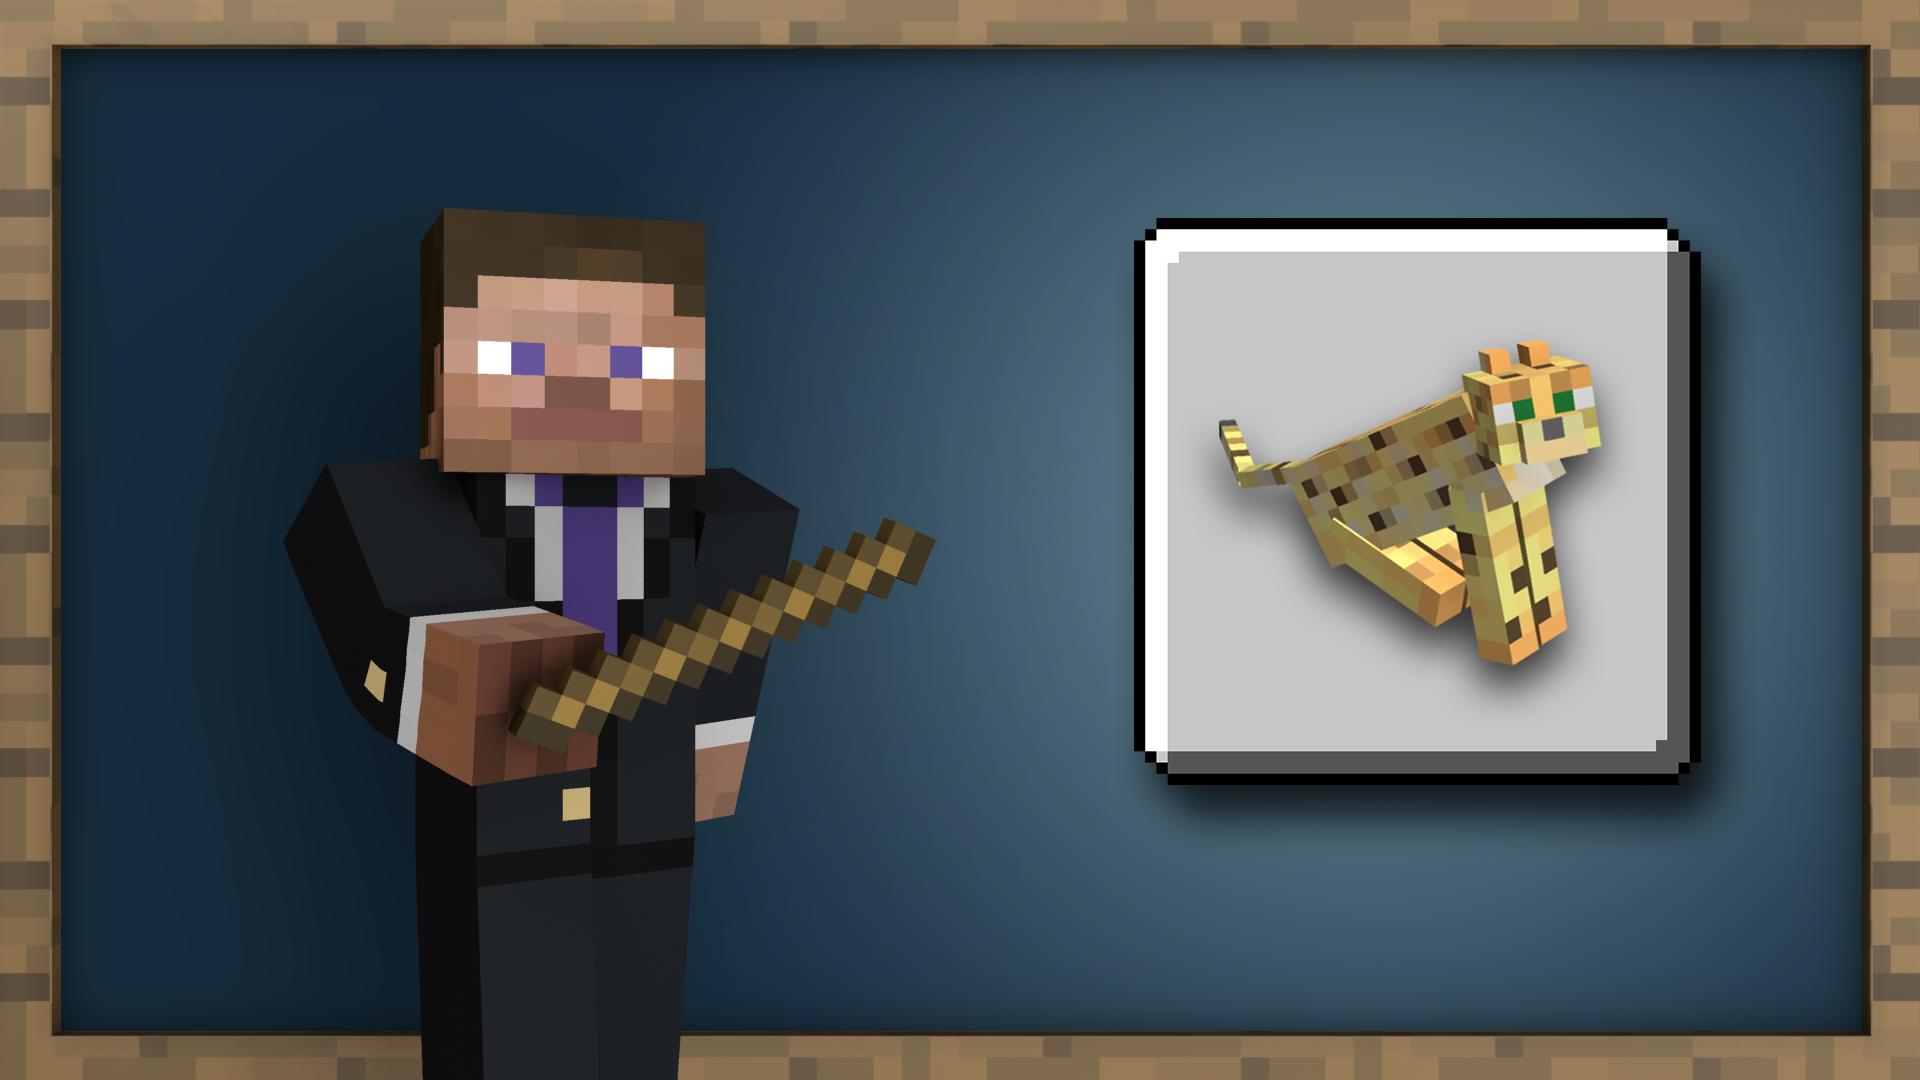 Lion Tamer achievement for Minecraft on Nintendo Switch